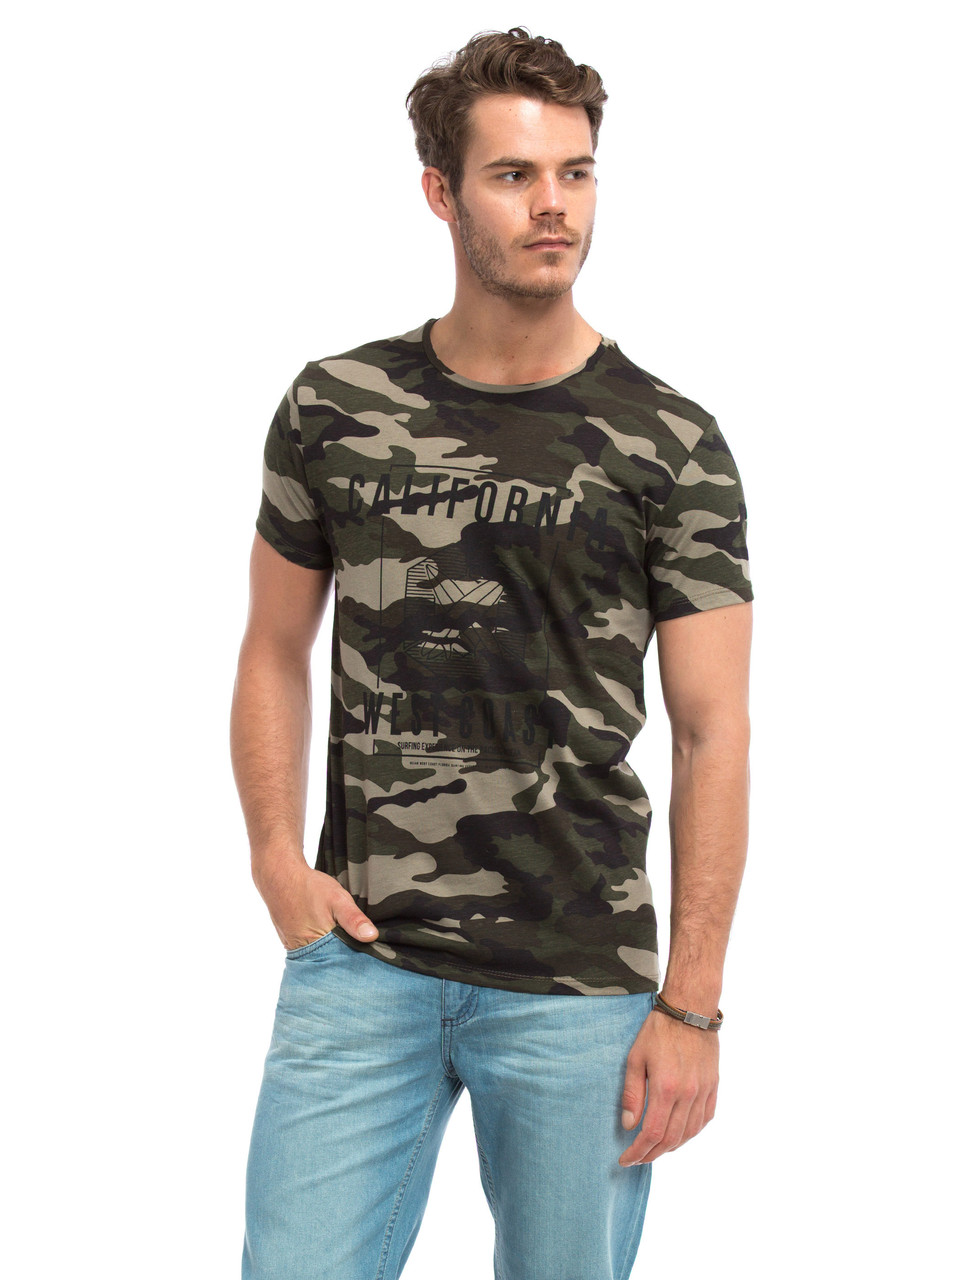 Мужская футболка Lc Waikiki / Лс Вайкики камуфляж с надписью California West Coast